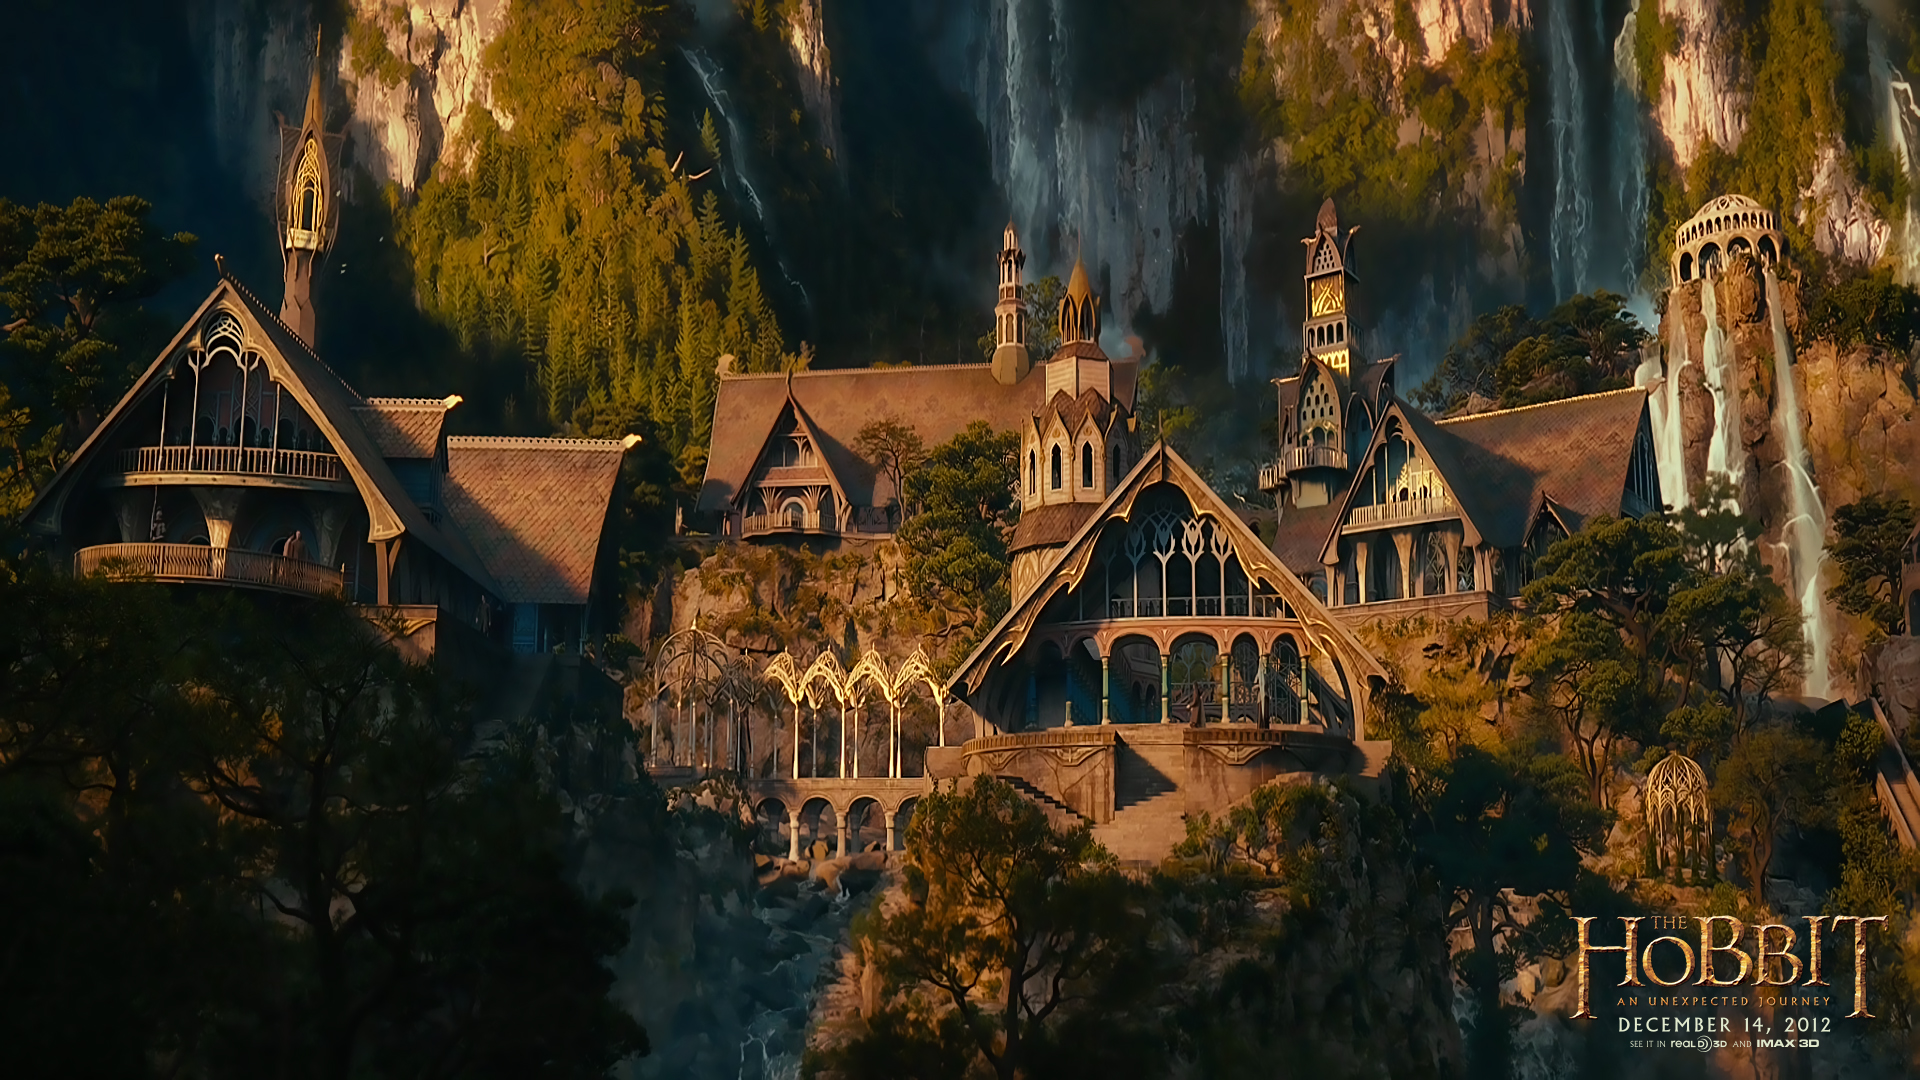 Fotos   The Hobbit The Hobbit Wallpaper 1920x1080